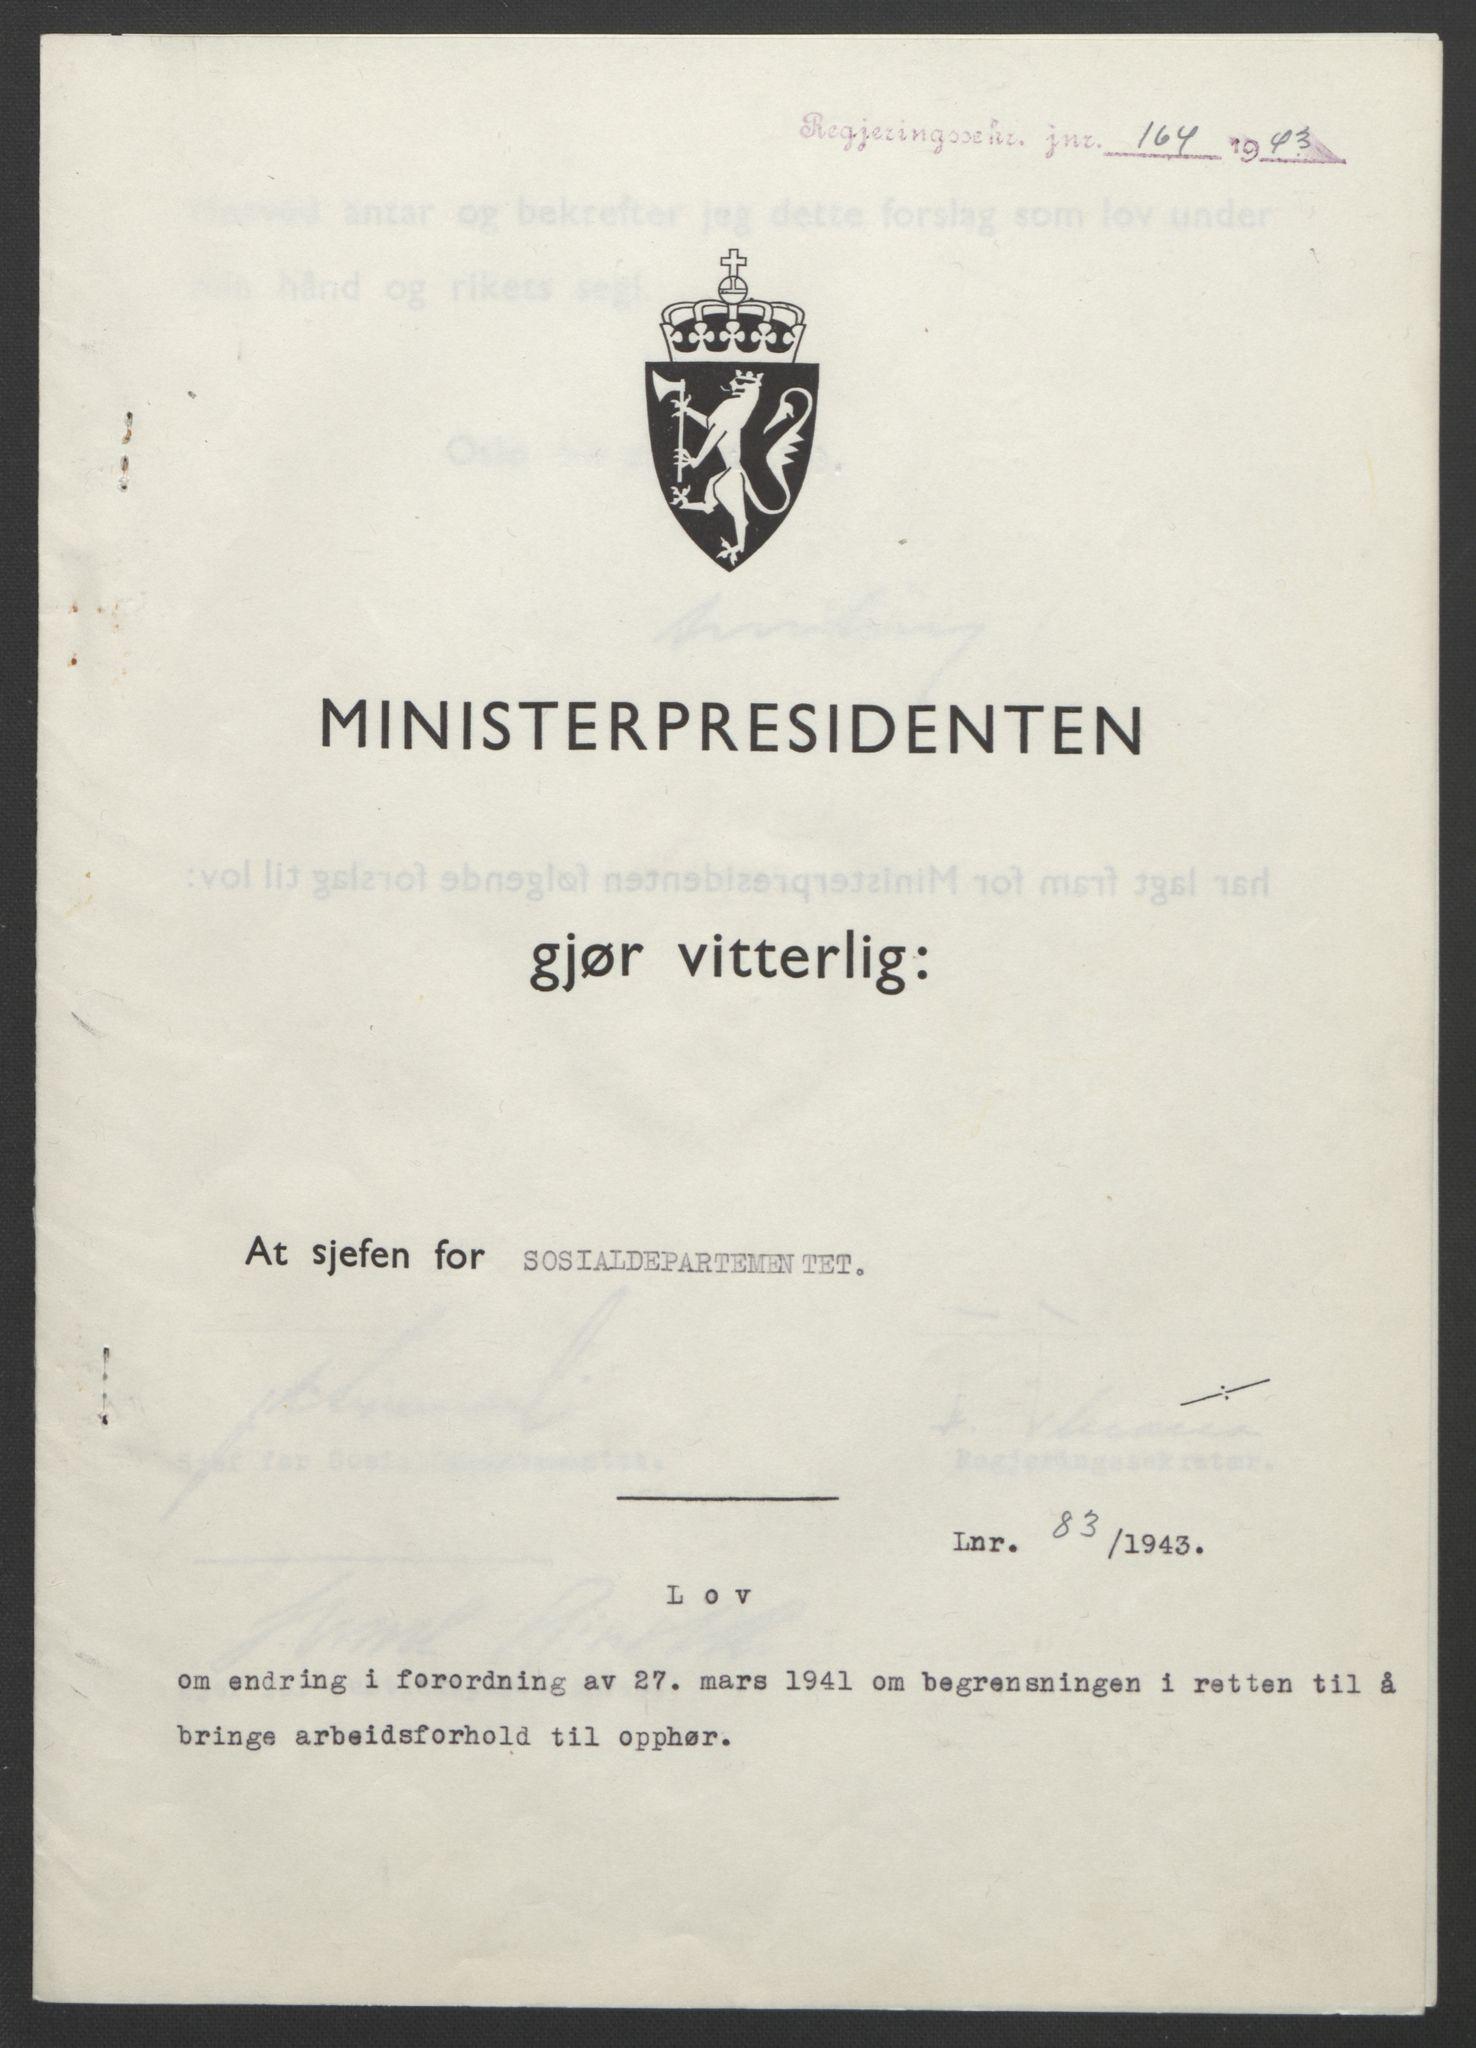 RA, NS-administrasjonen 1940-1945 (Statsrådsekretariatet, de kommisariske statsråder mm), D/Db/L0099: Lover, 1943, s. 378